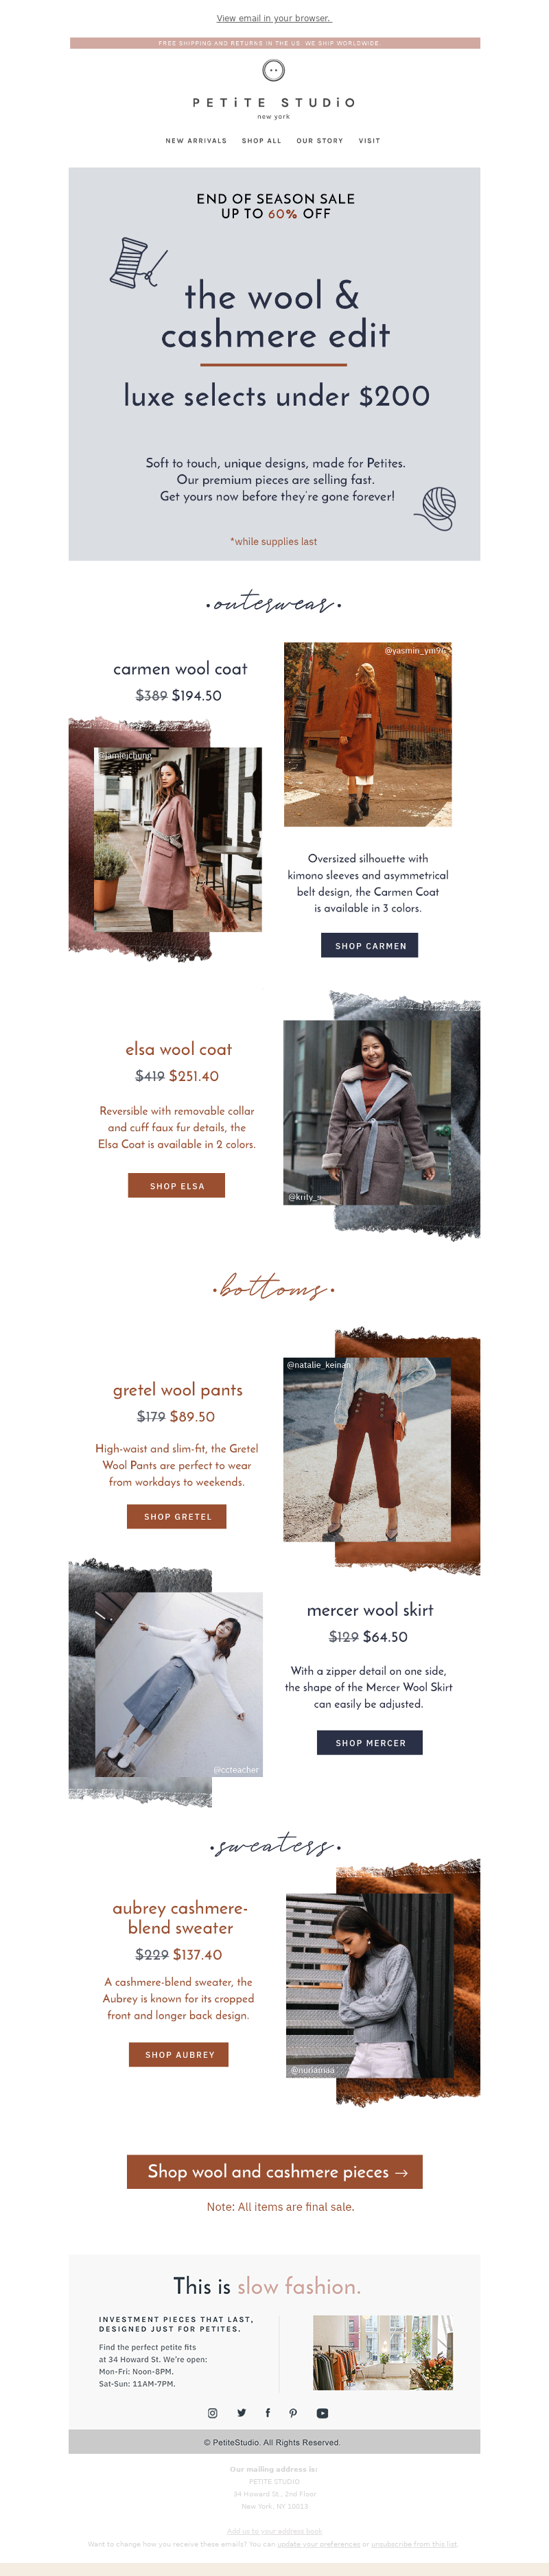 Petite Studio - Wool & Cashmere Under $250